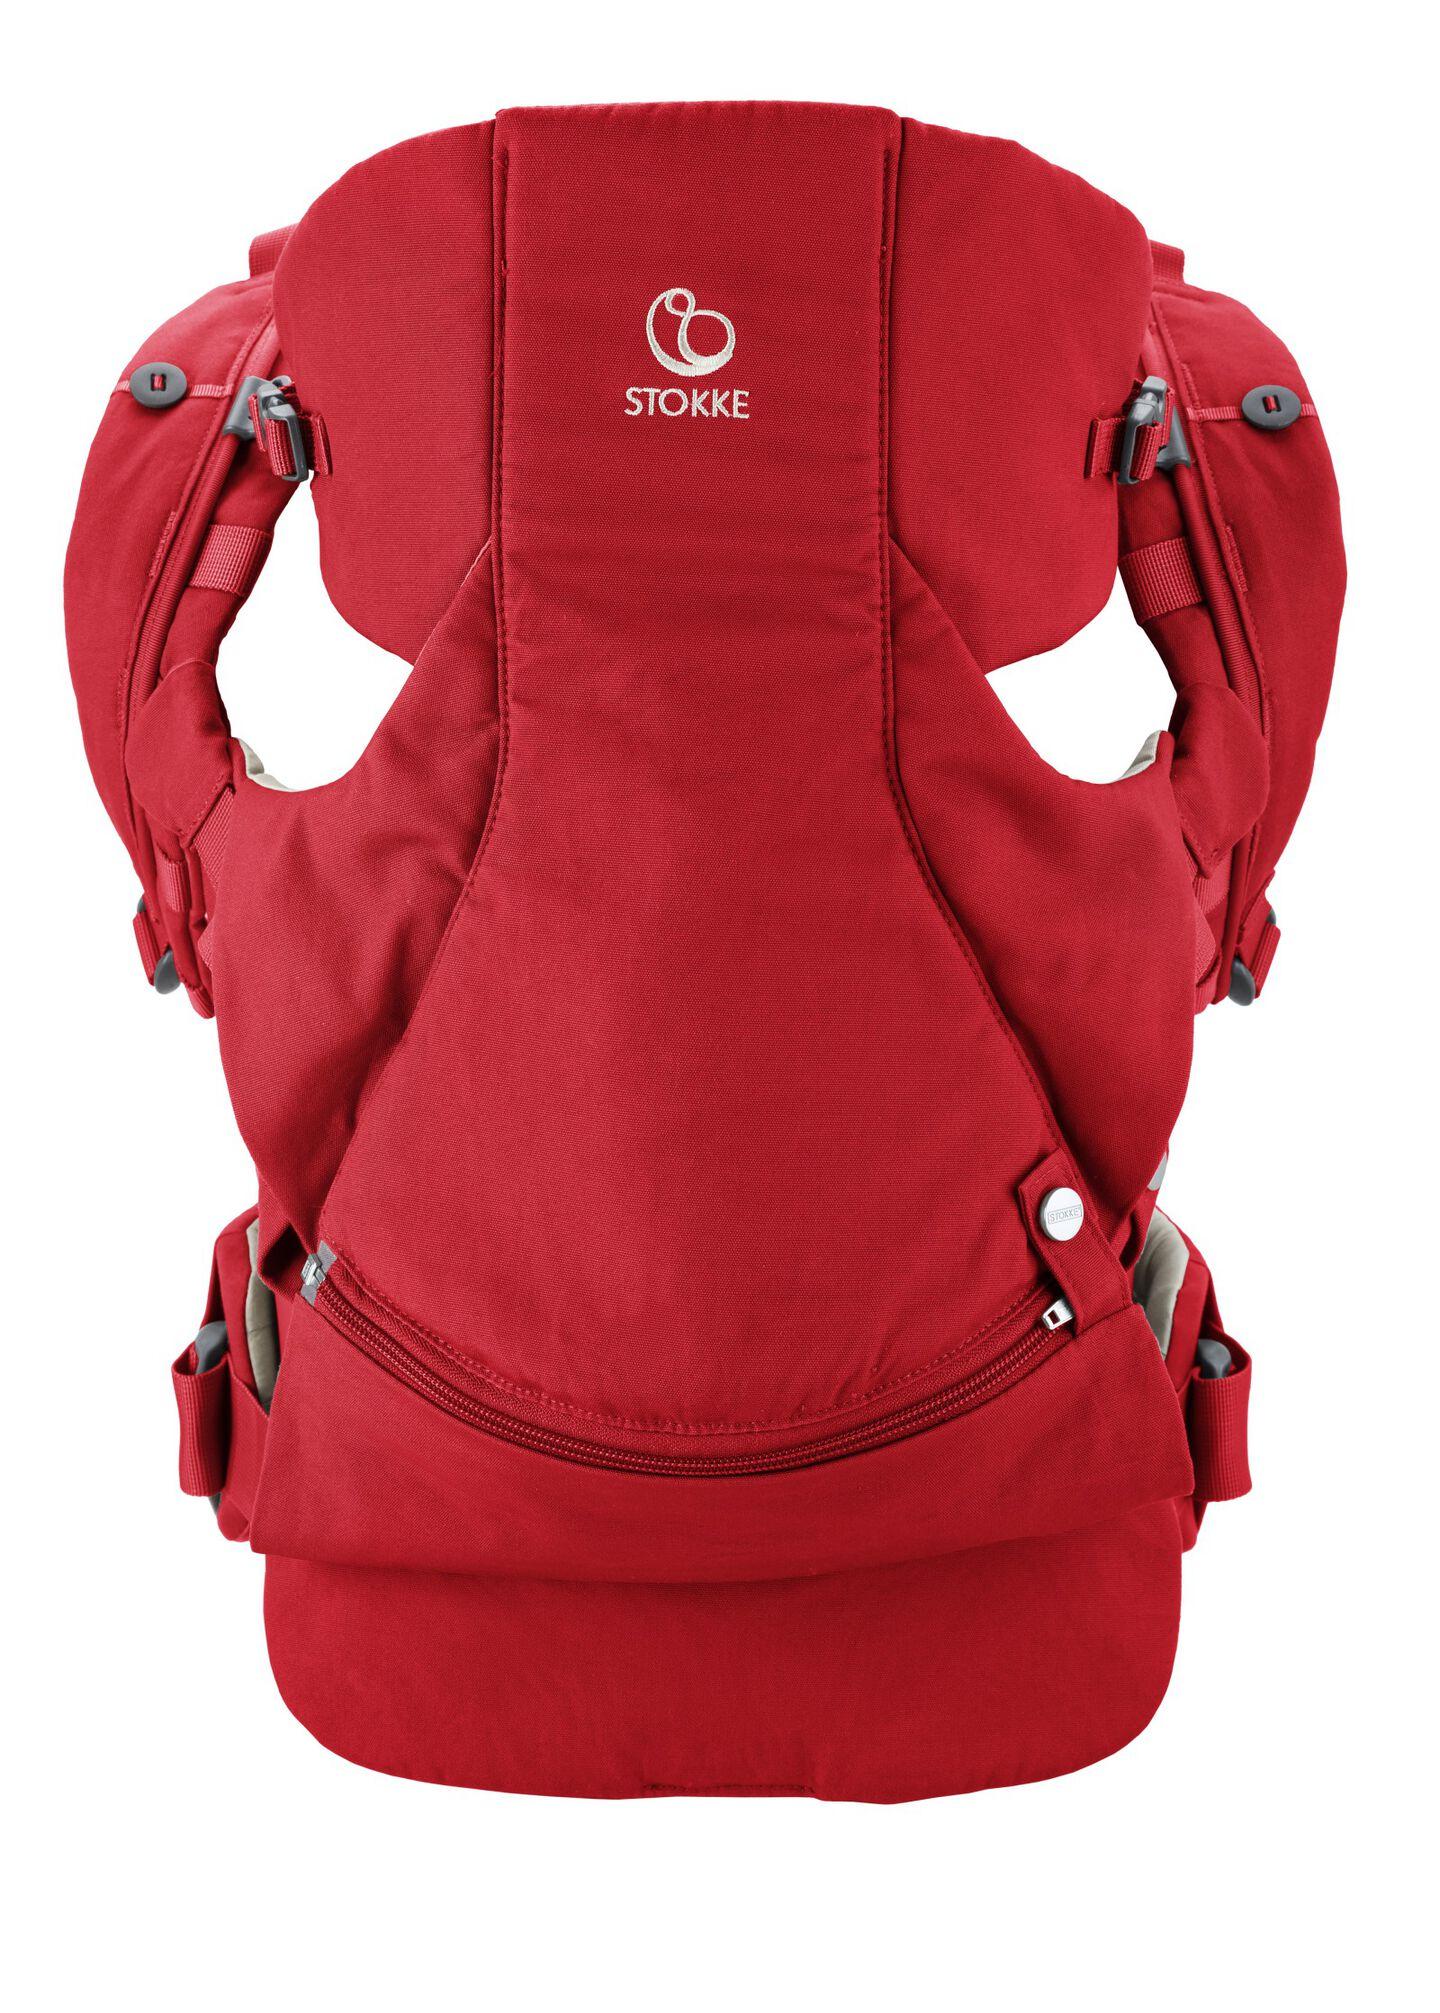 Stokke® MyCarrier™ Front Carrier, Red.